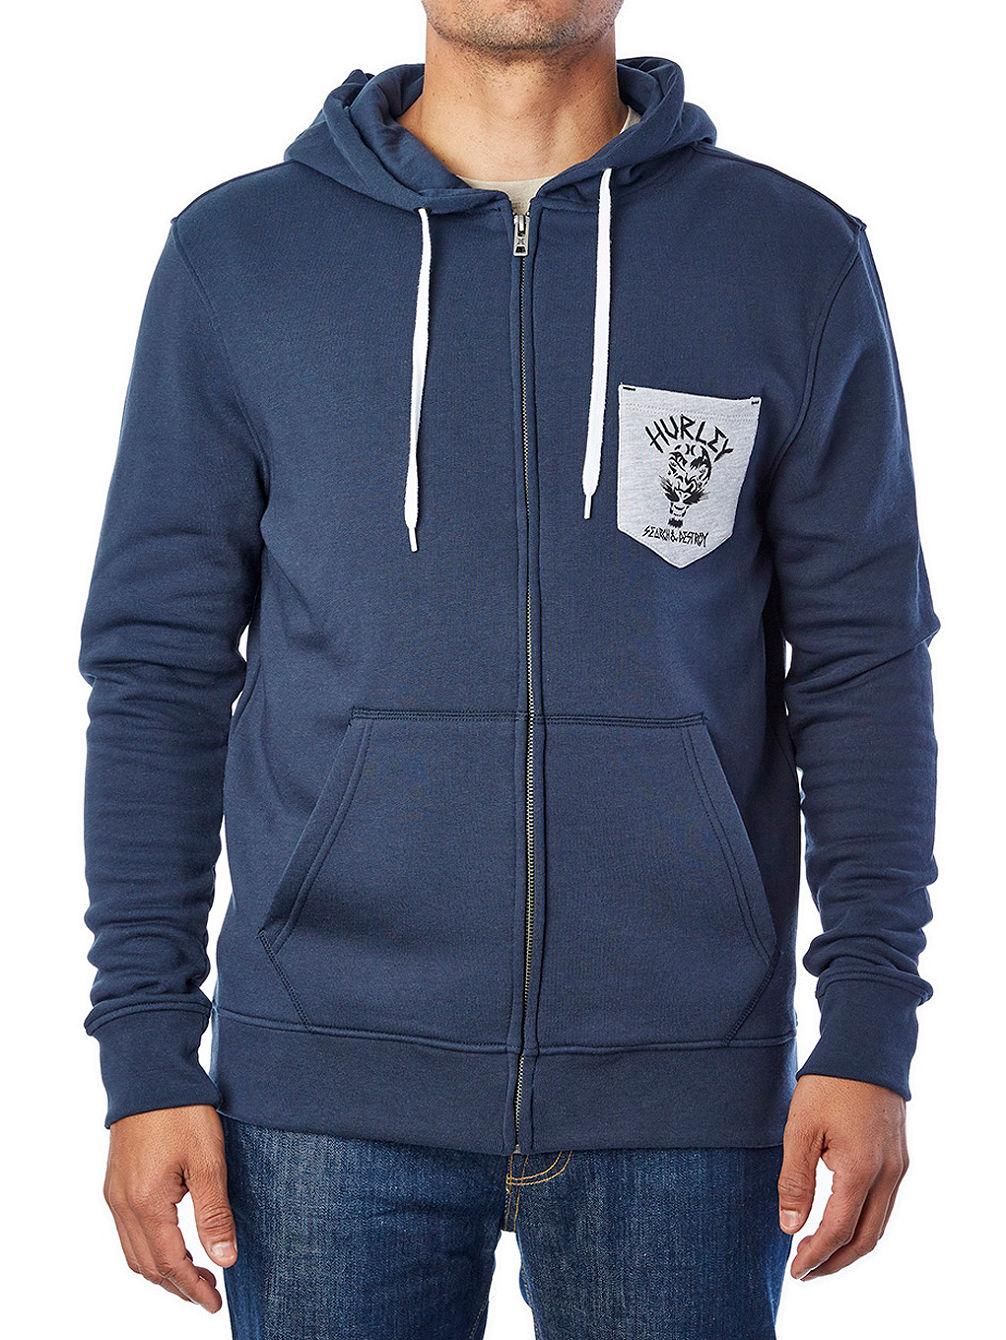 search-destroy-zip-hoodie